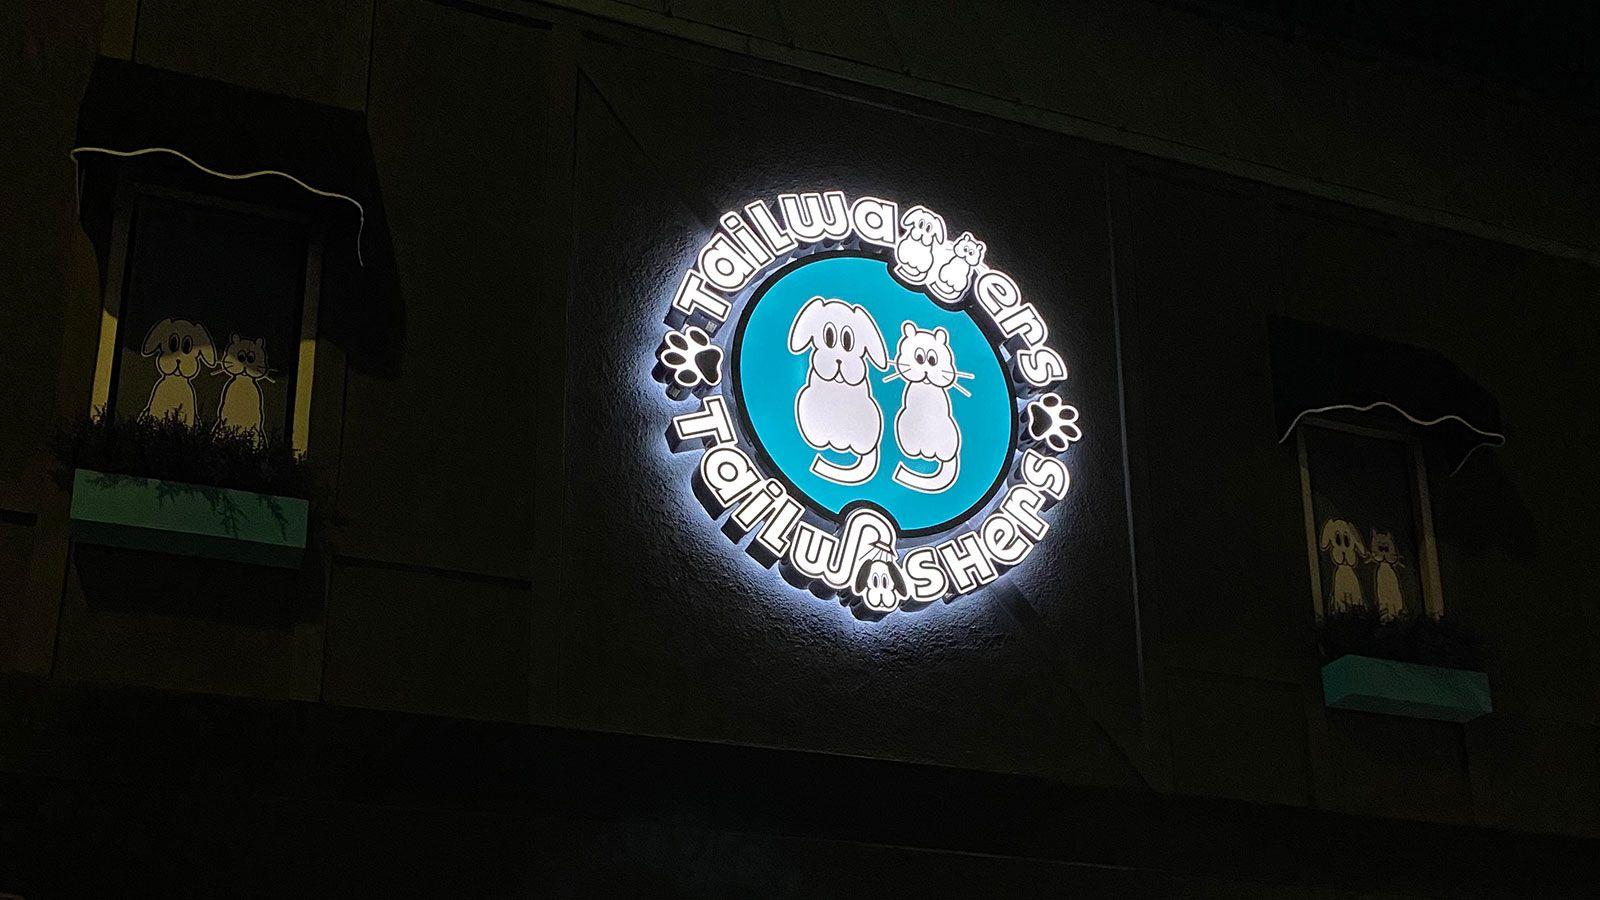 Tailwashers dual lit sign